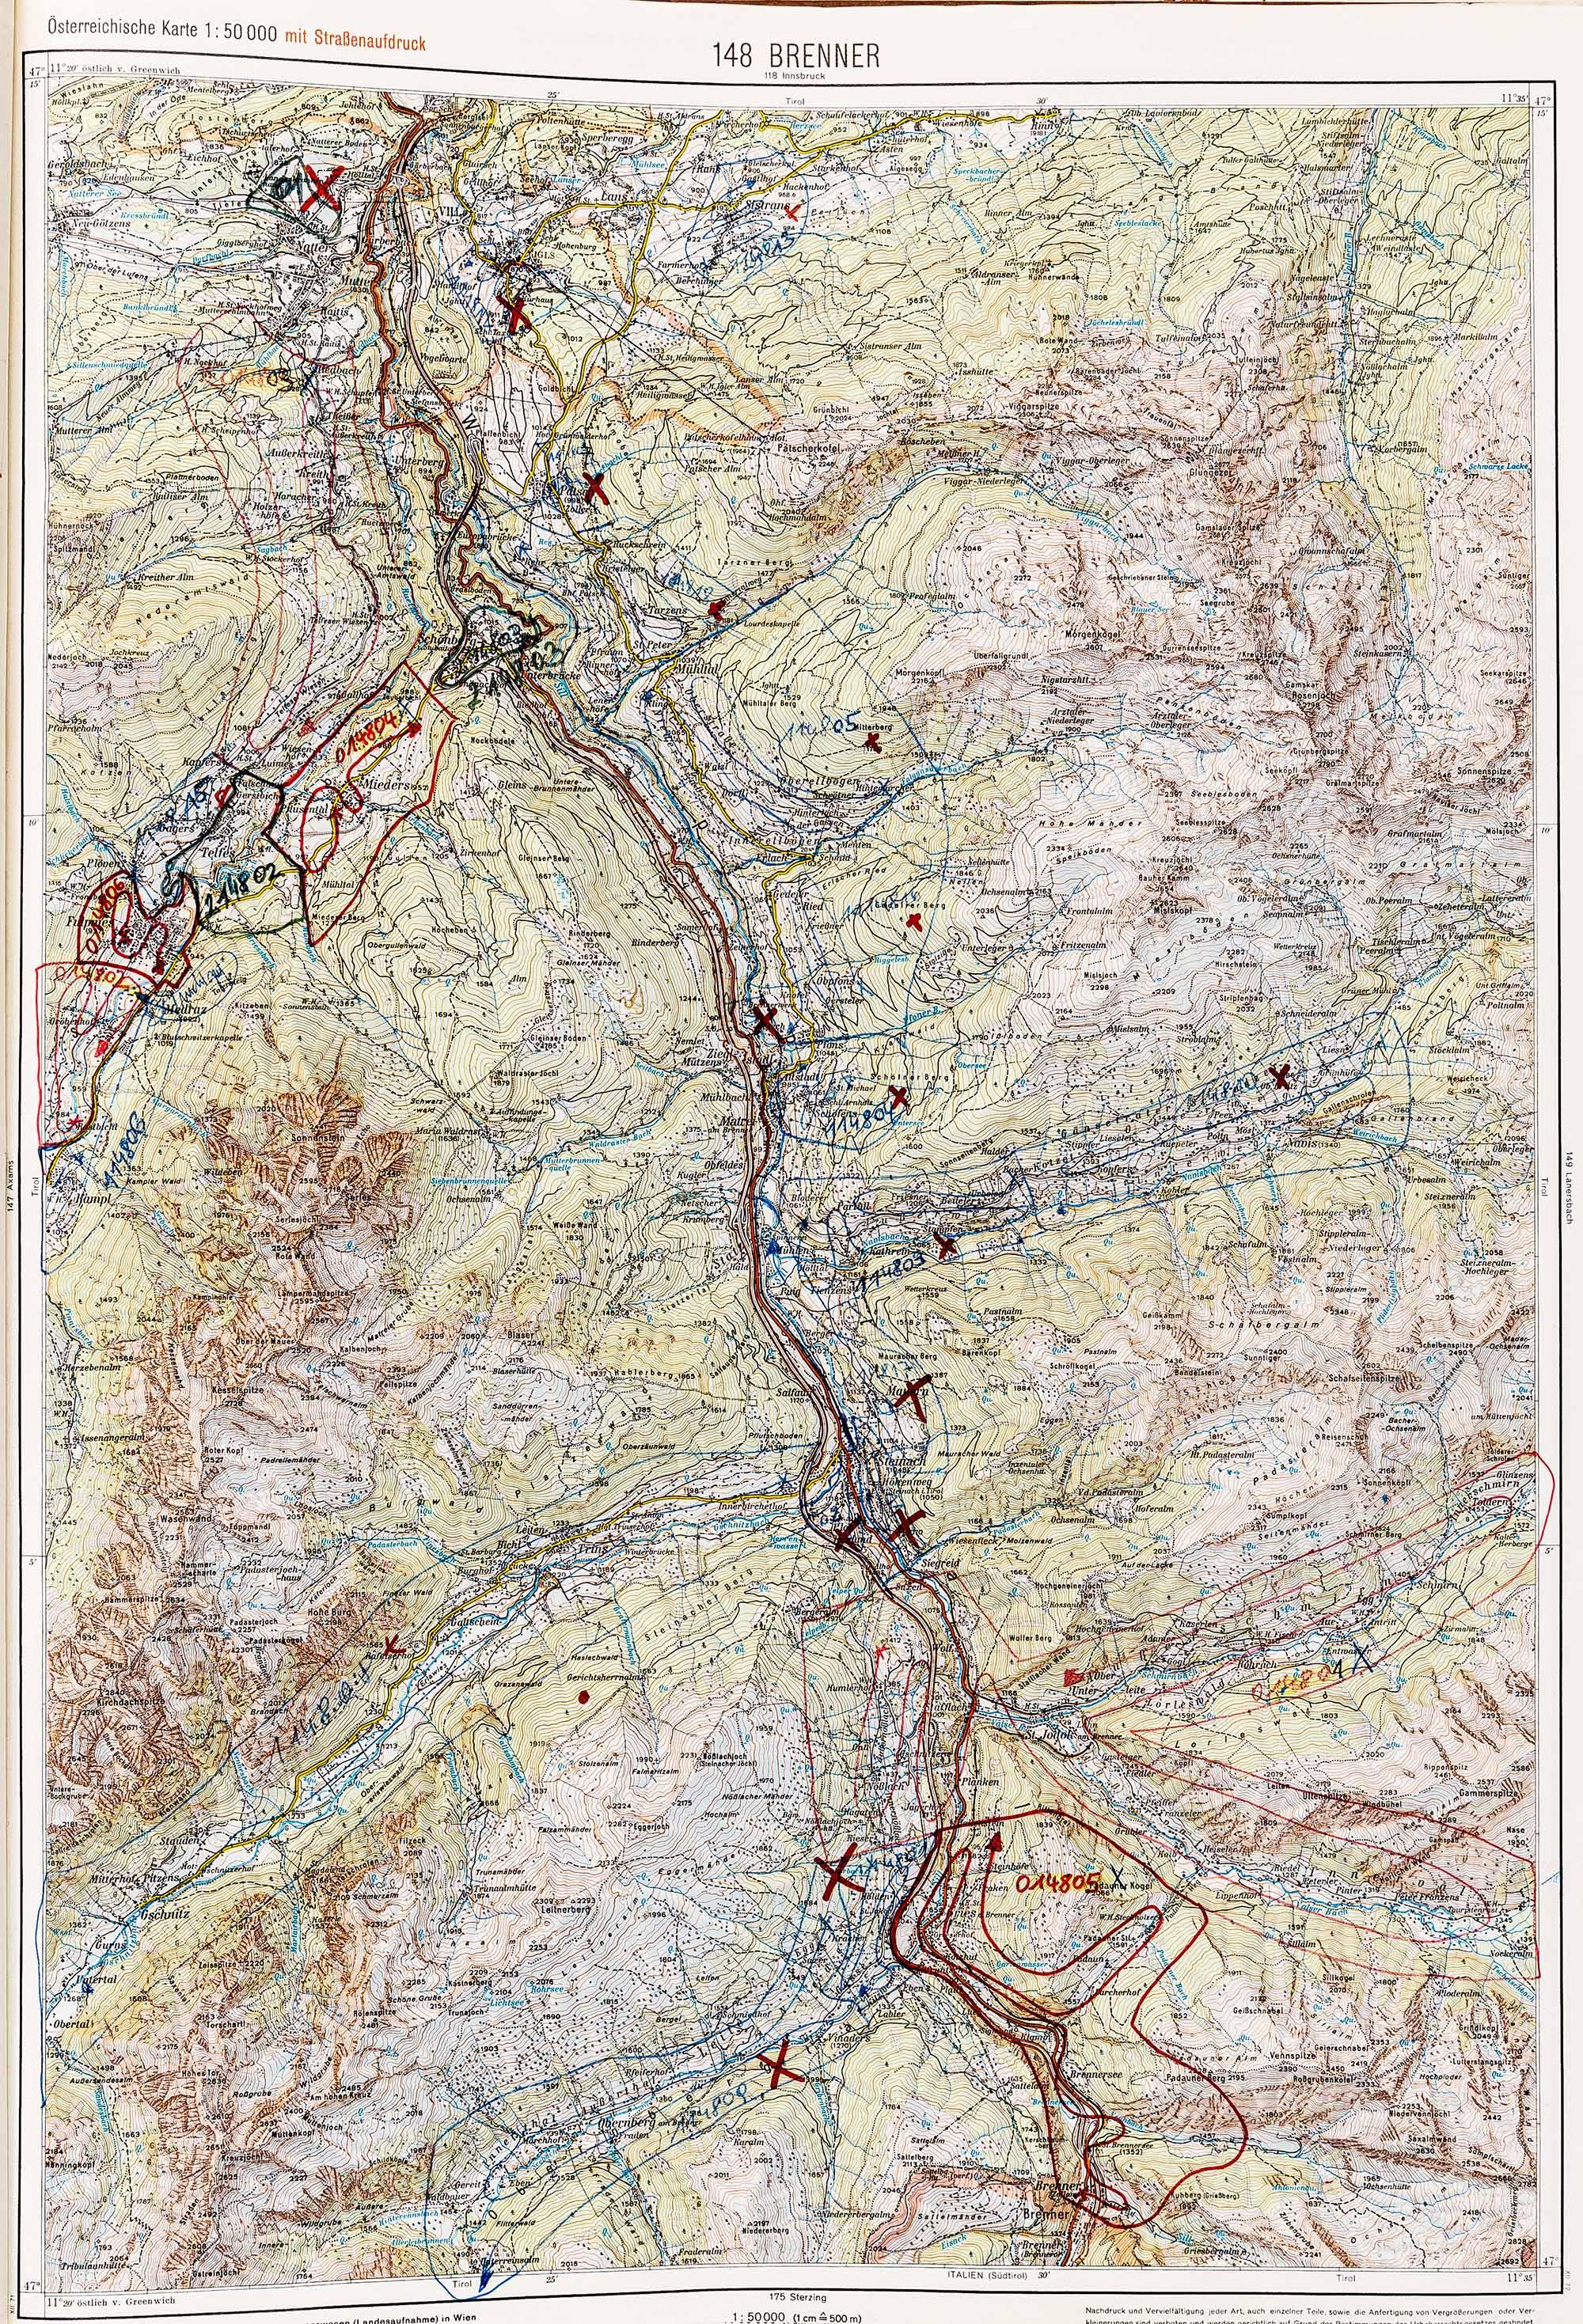 1979-1982 Karte 148